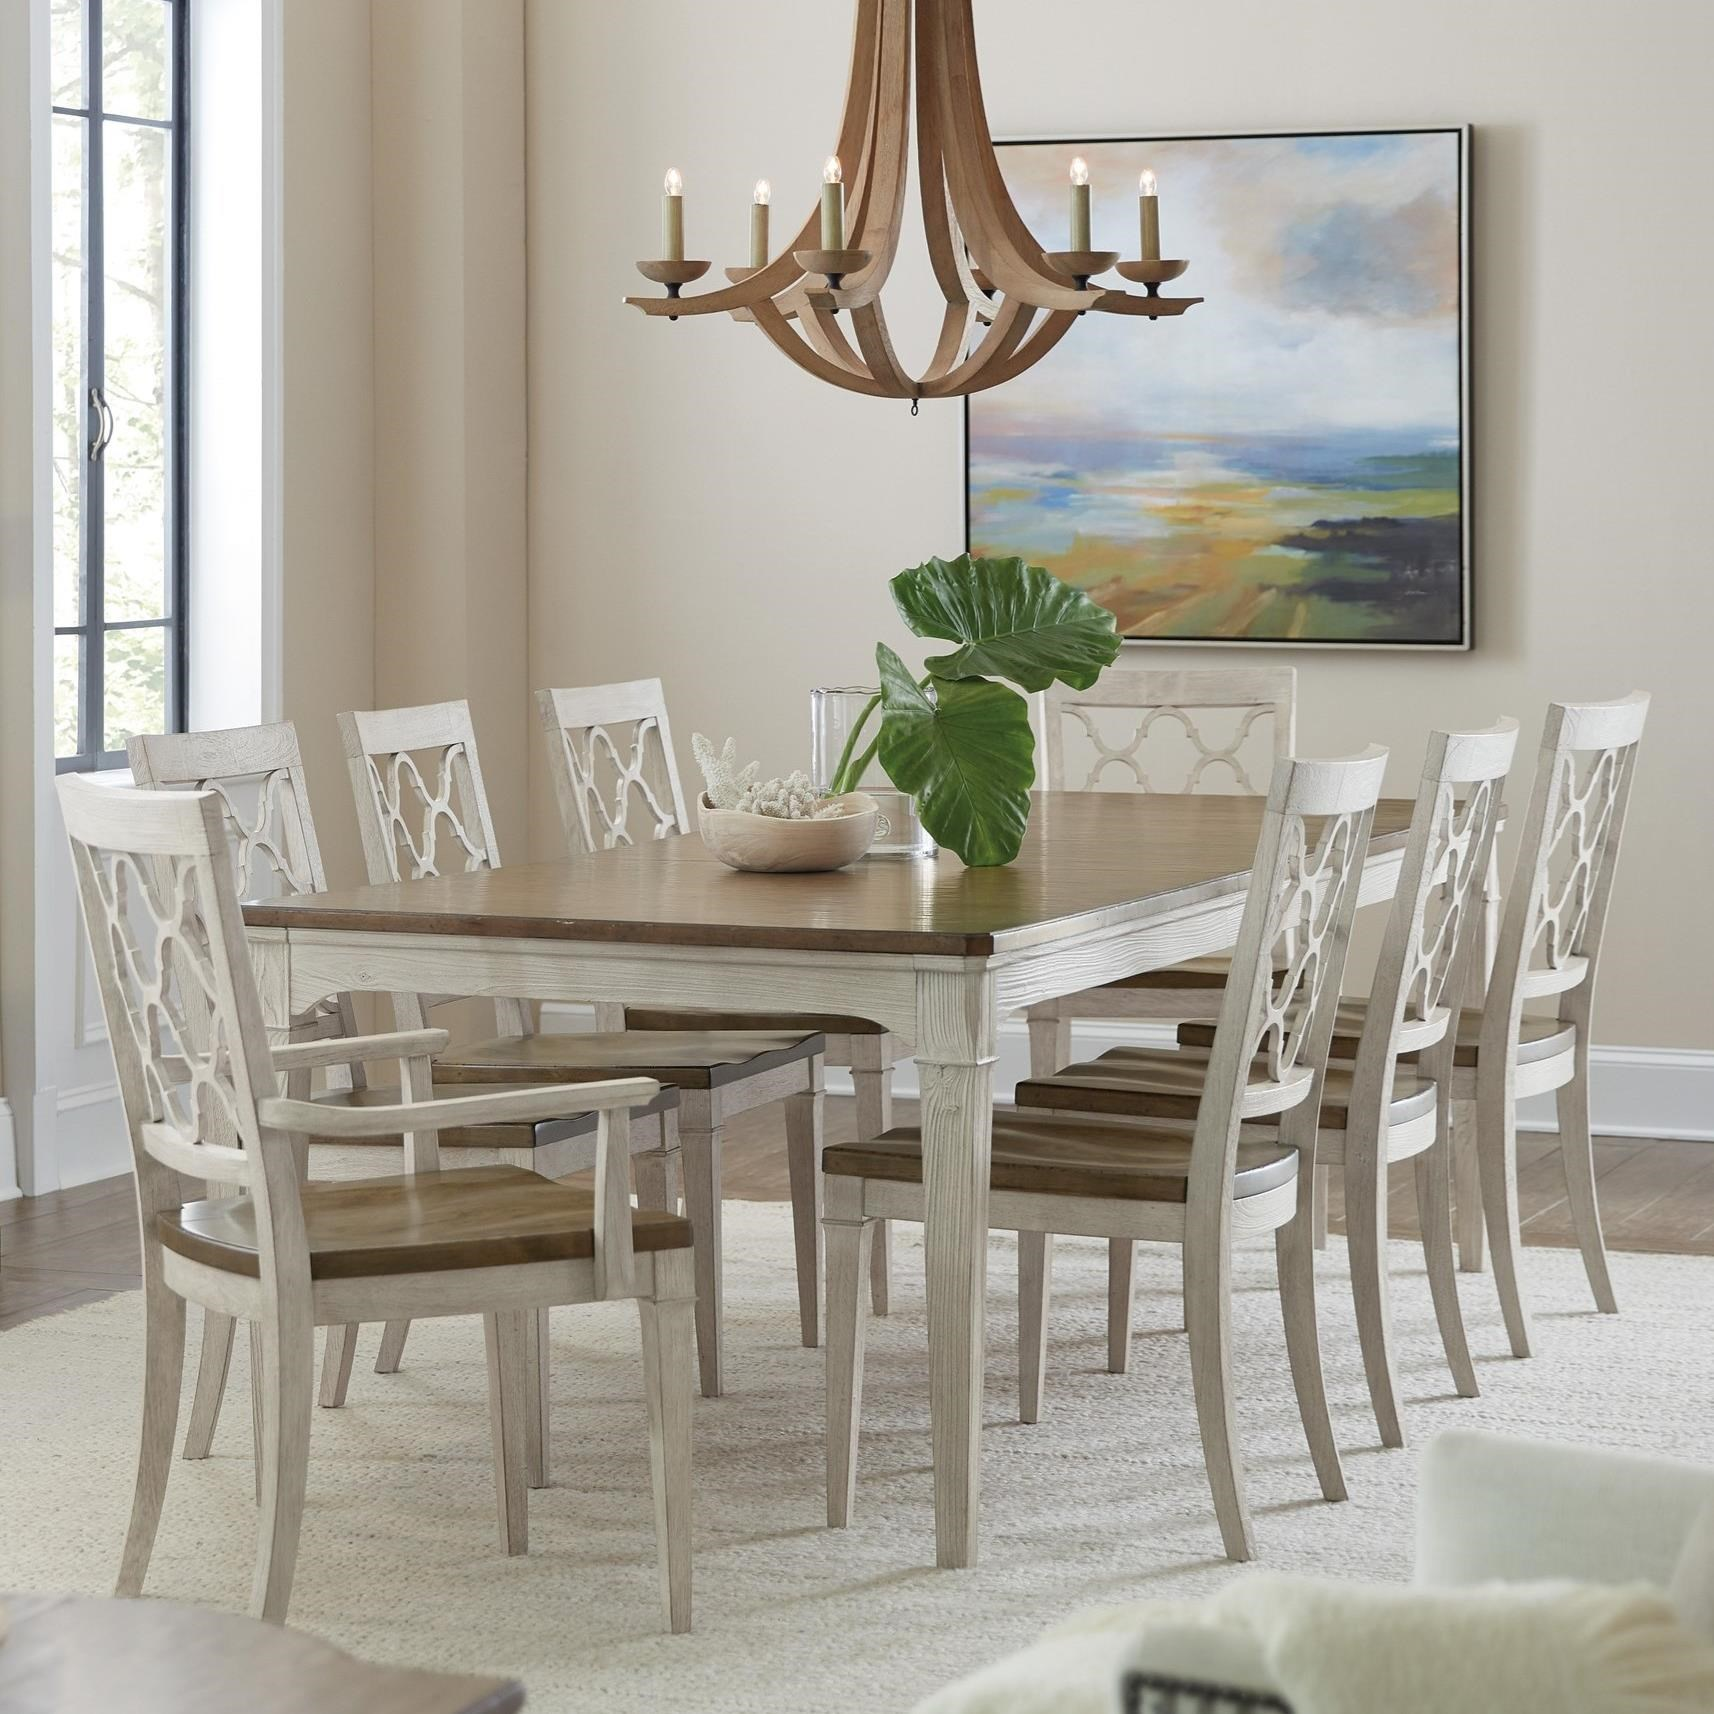 Montebello 9-Piece Dining Set by Hooker Furniture at Baer's Furniture